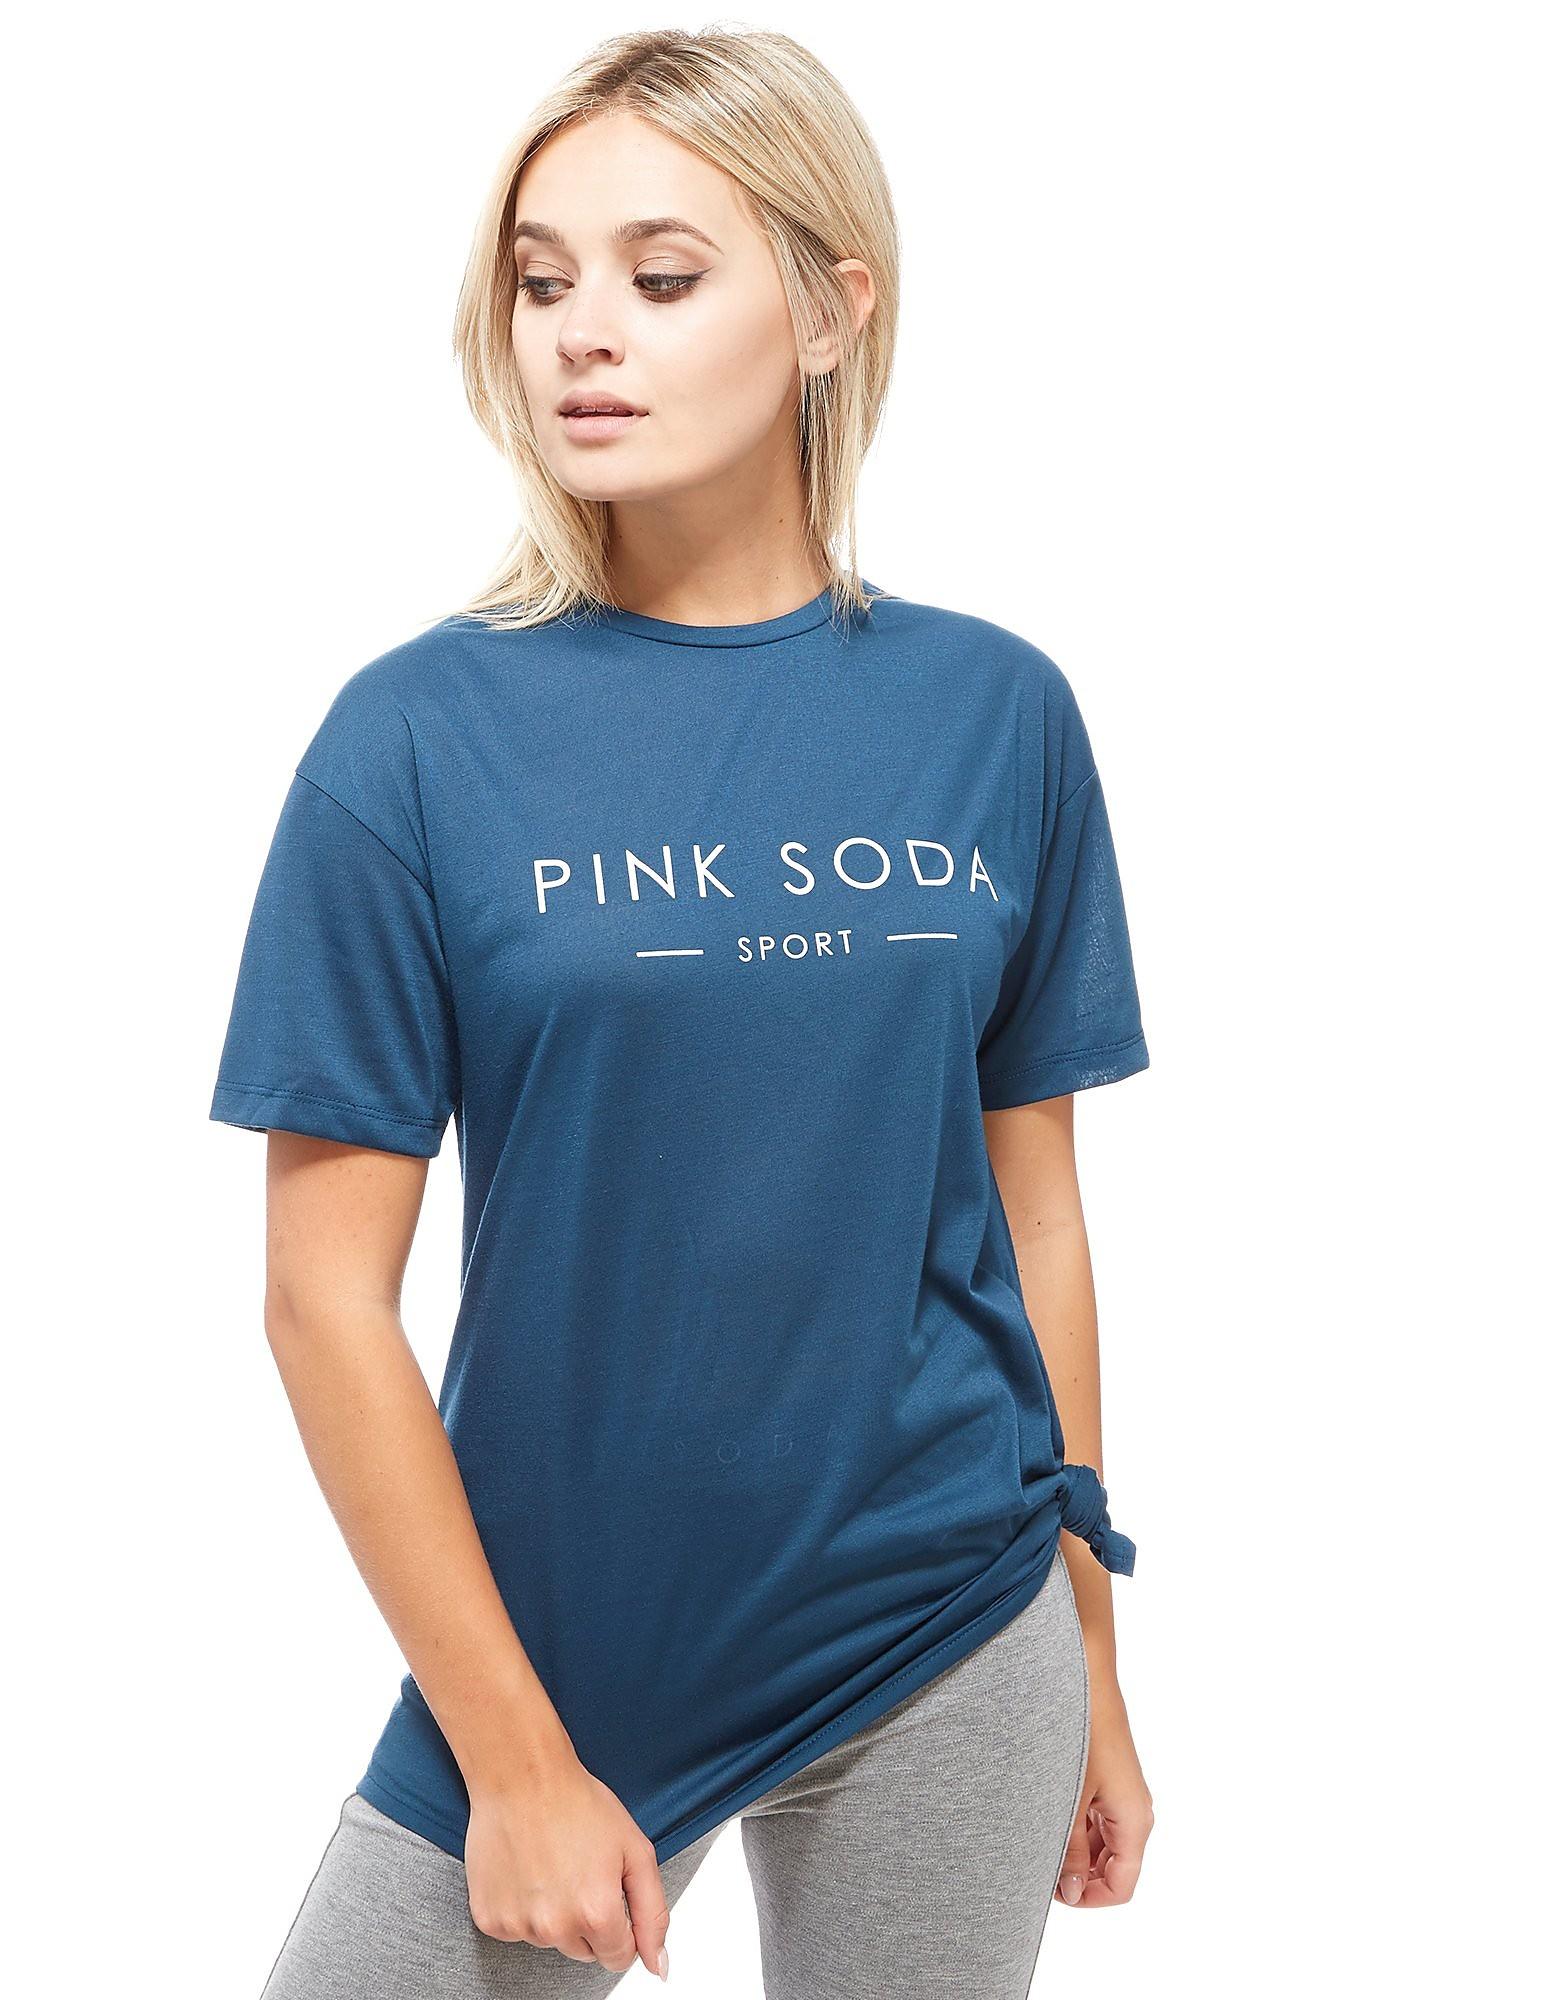 Pink Soda Sport camiseta Reps Knot